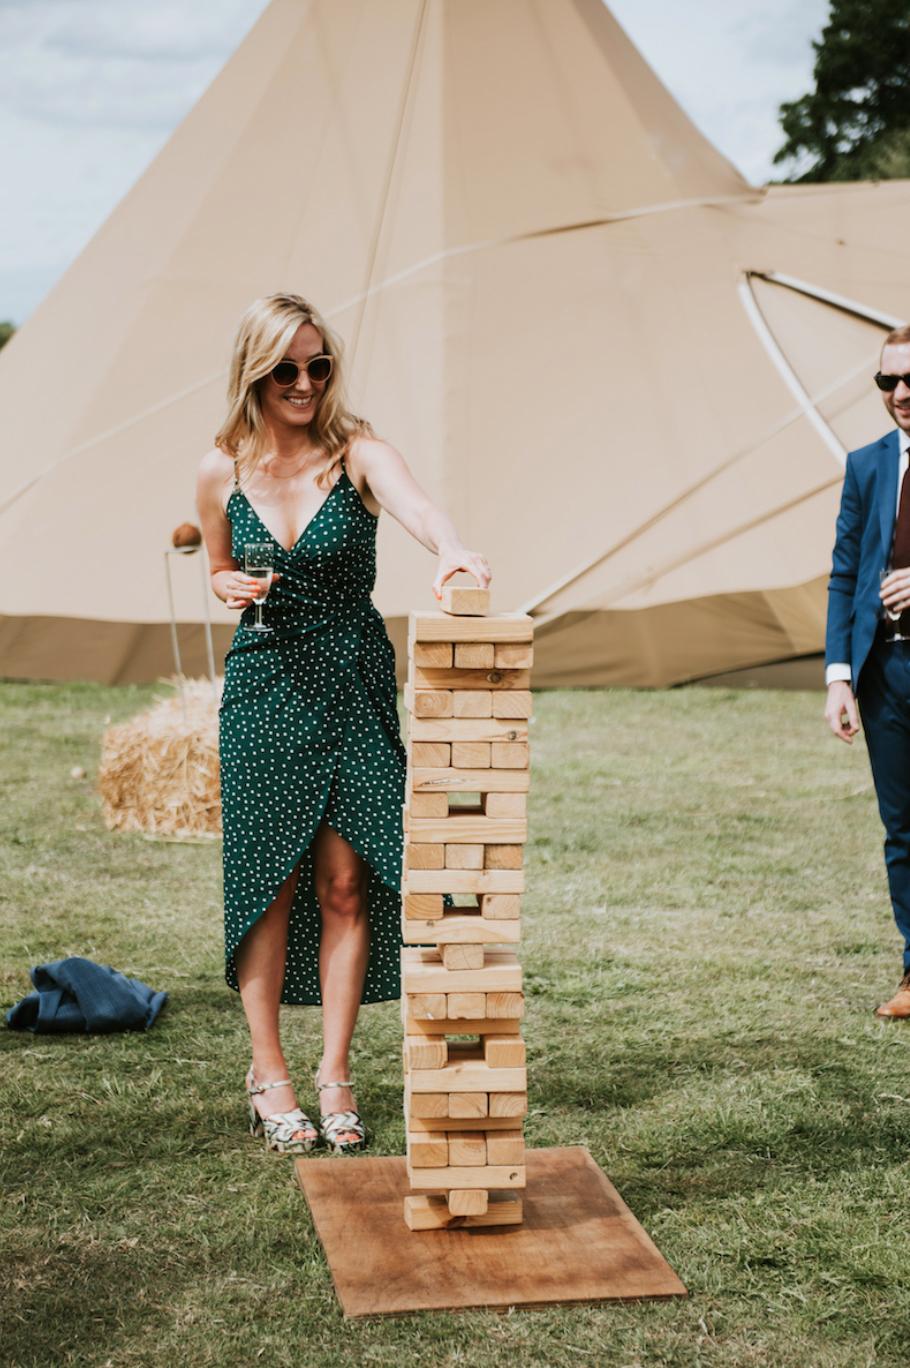 giant jenga at wedding